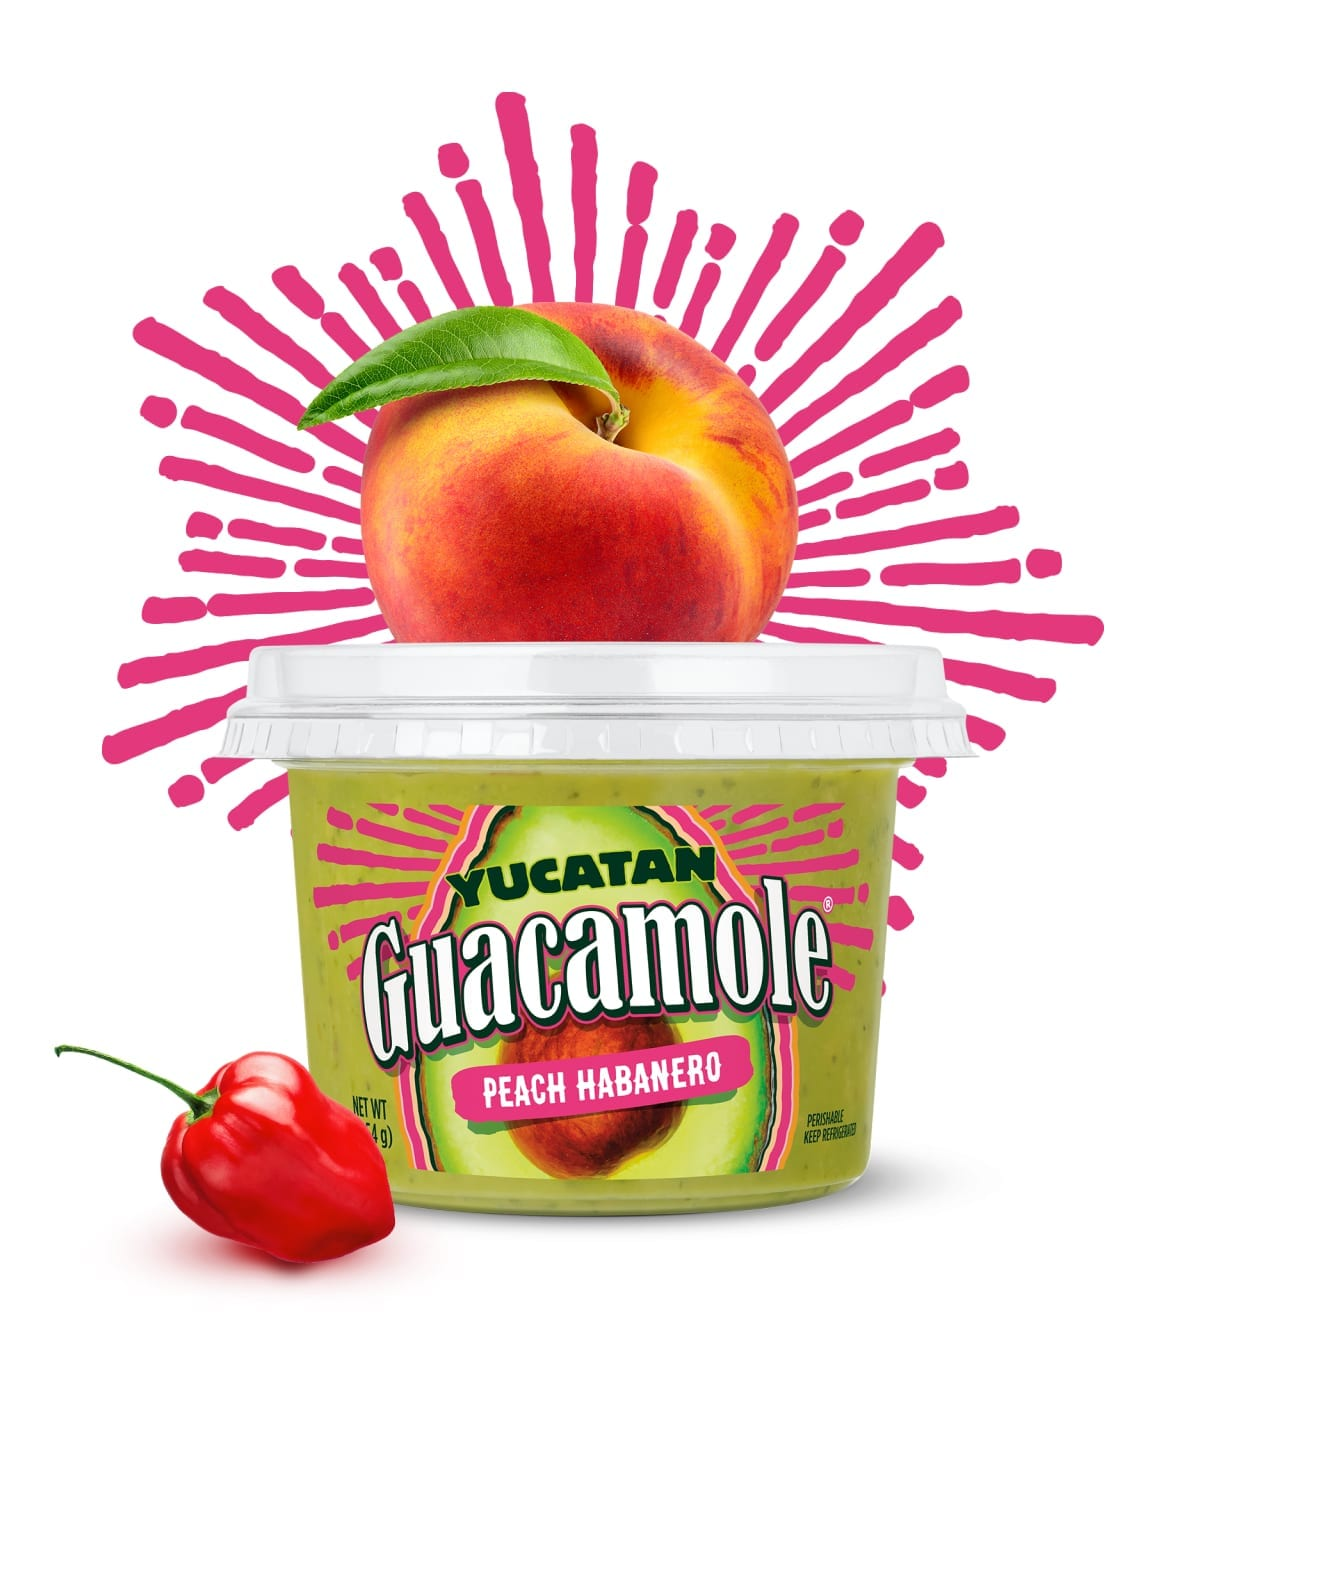 yucatan packaging design company